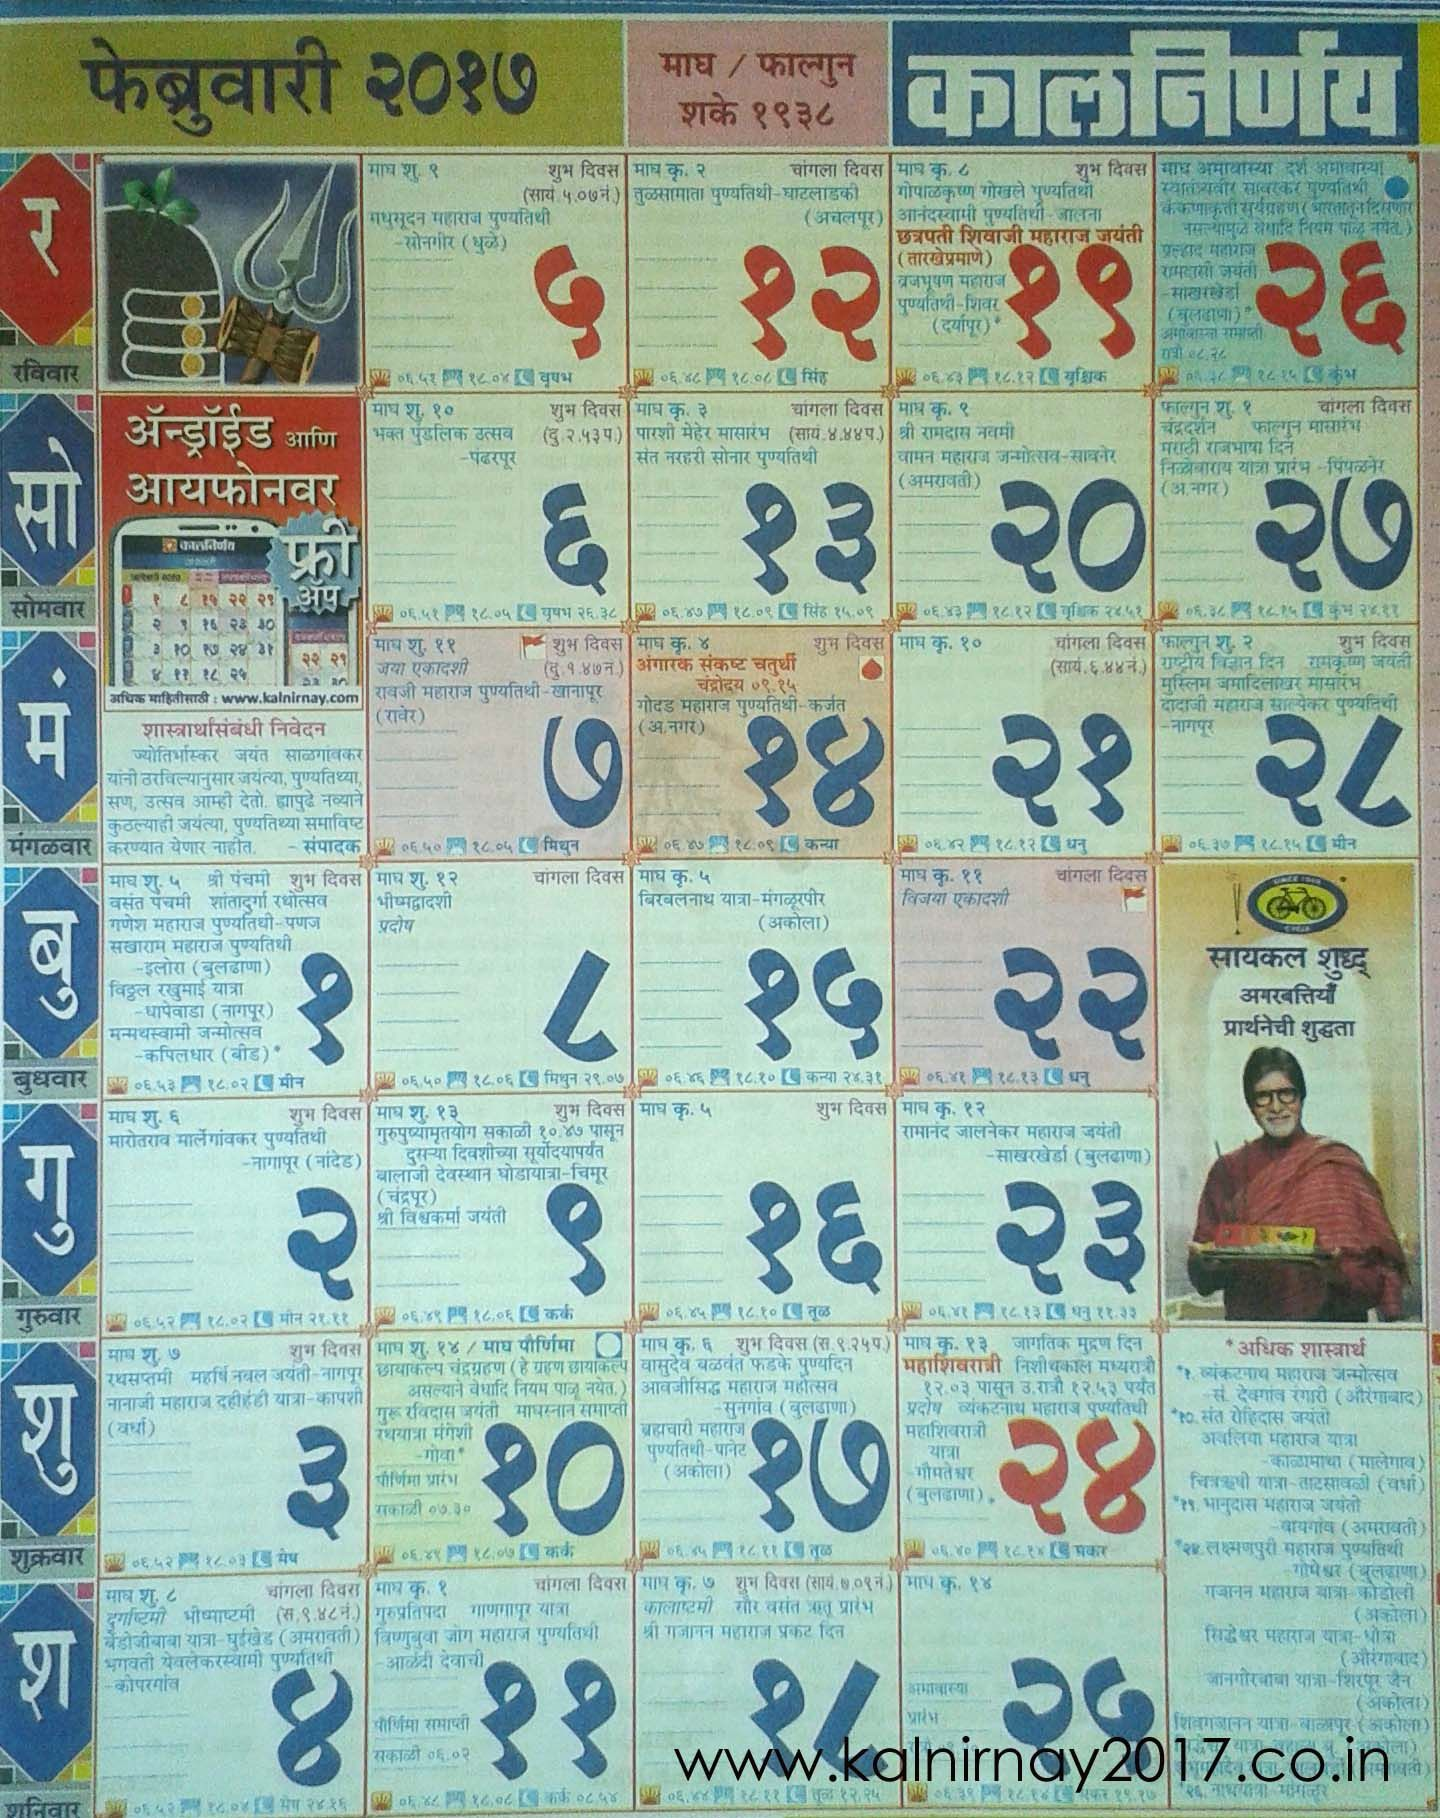 February Month Marathi Kalnirnay Calendar 2017 For more calendar ...